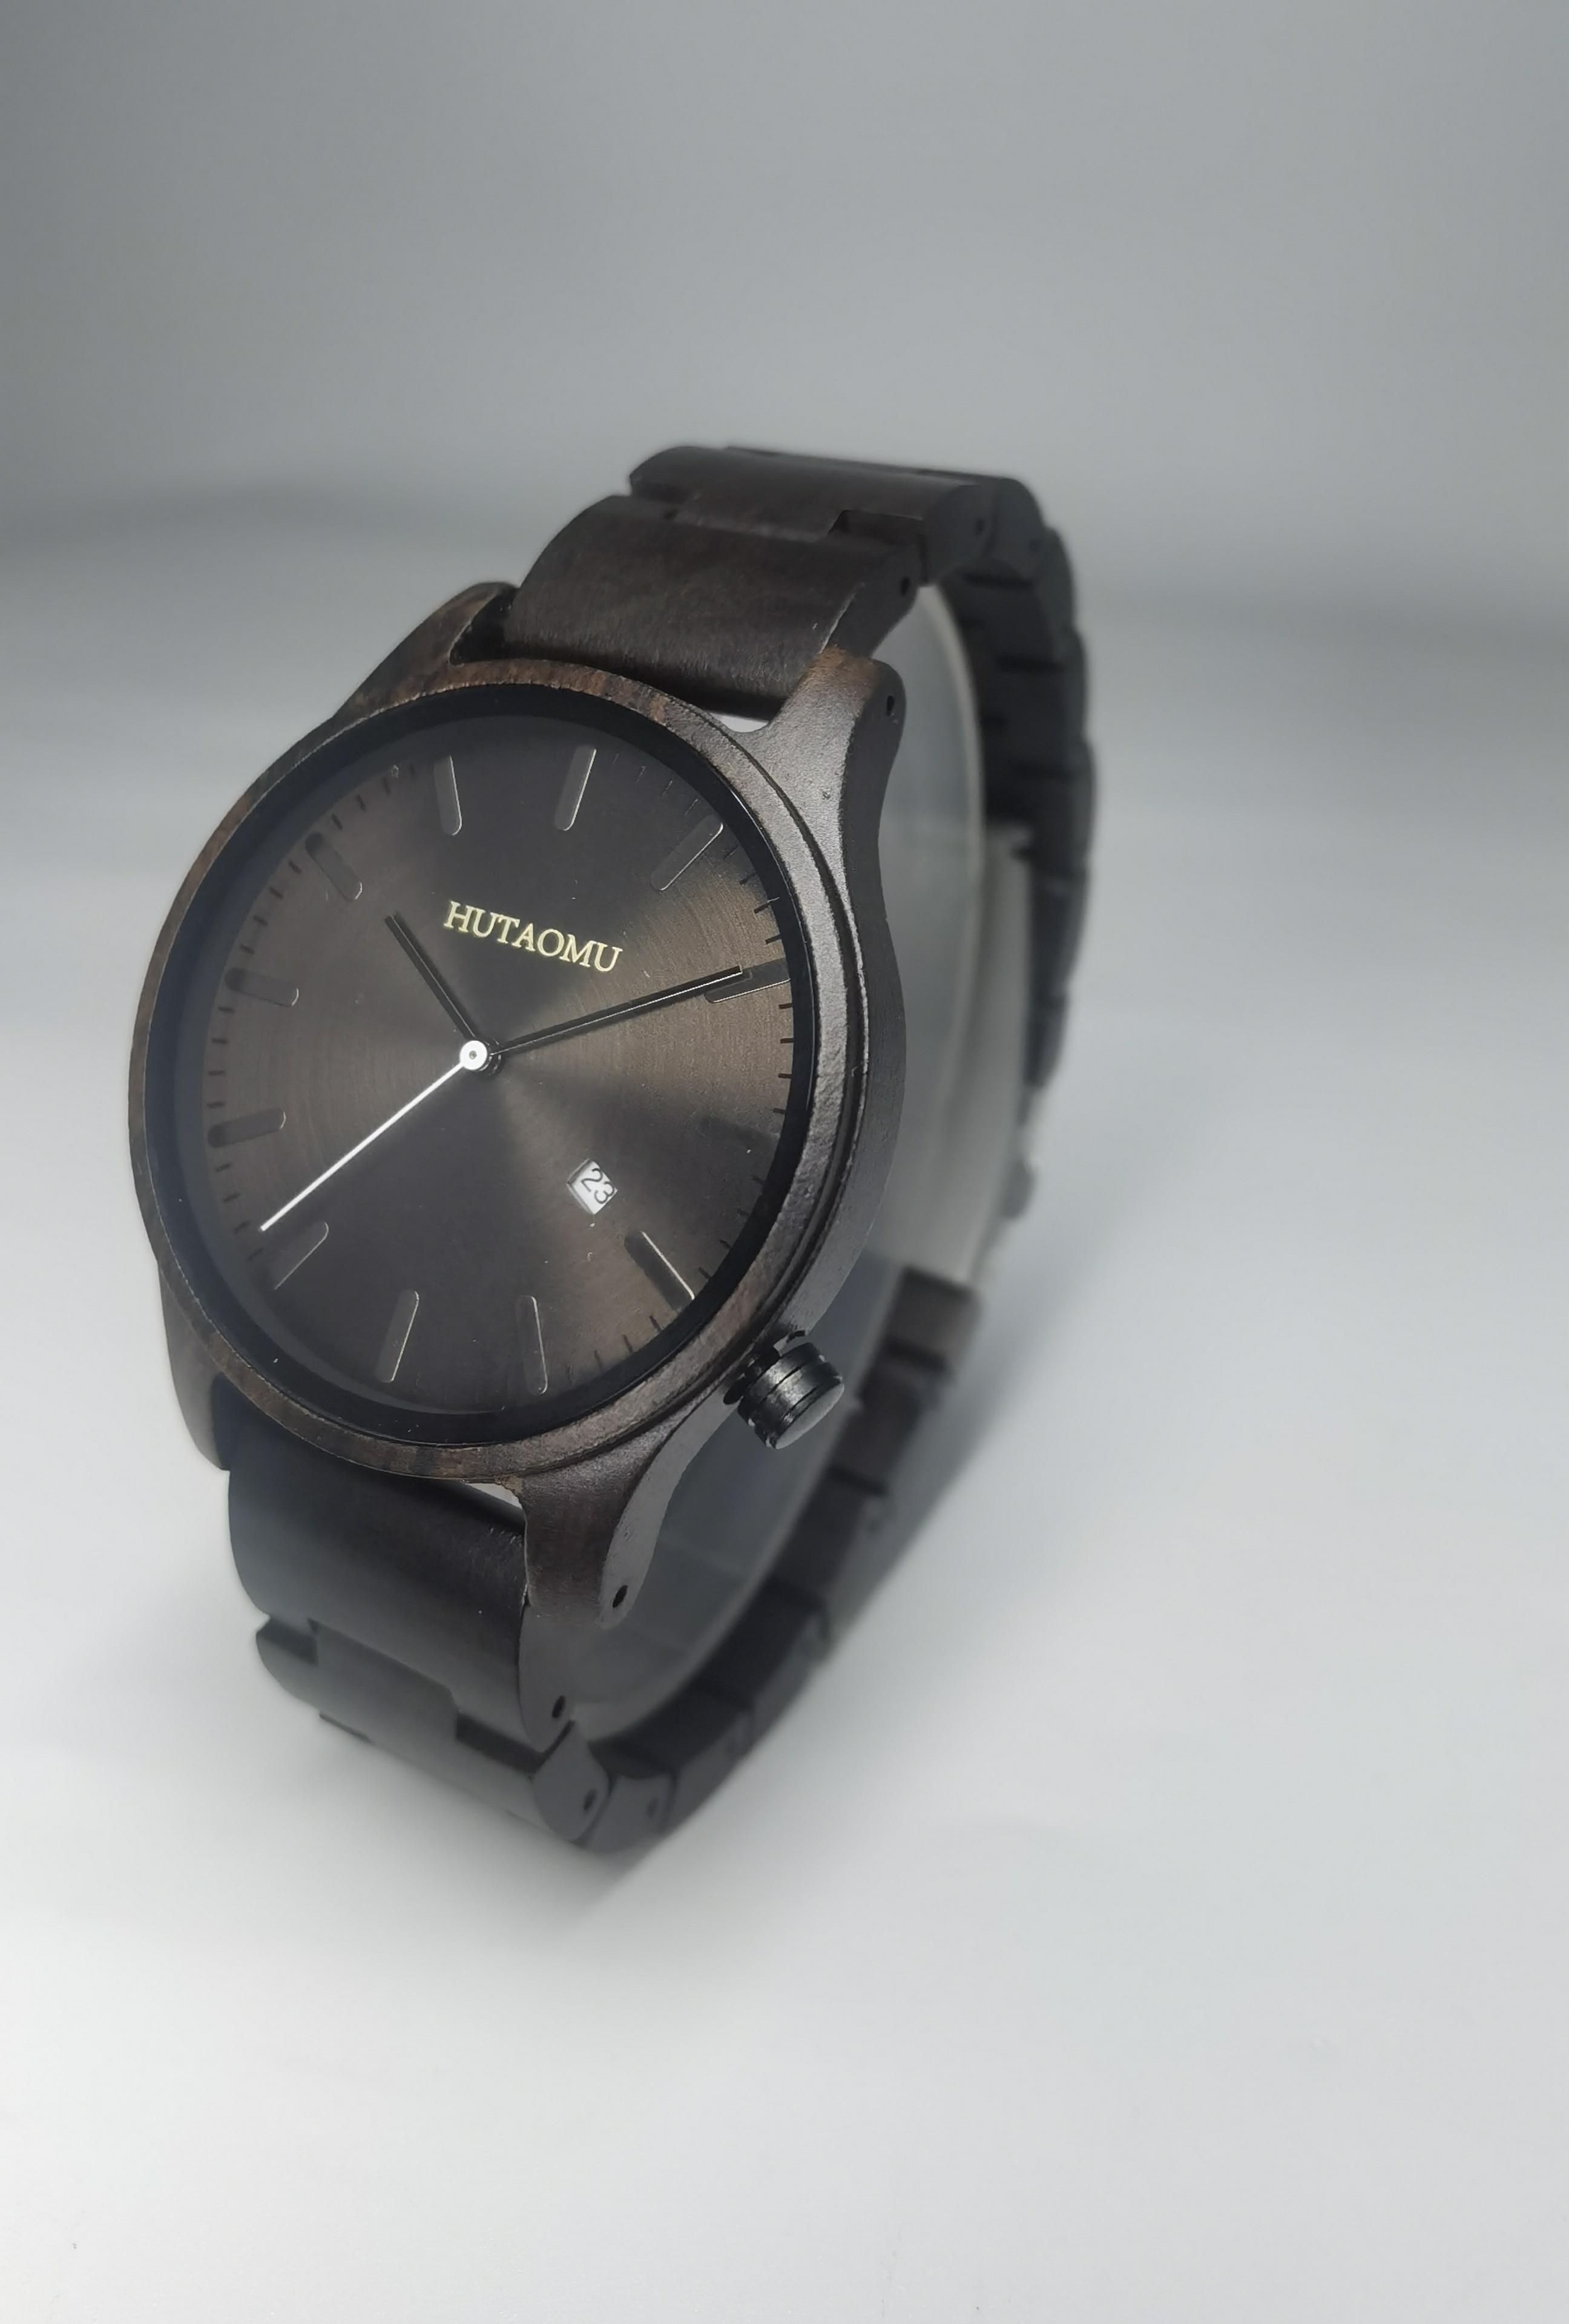 HUTAOMU Watch Men's Standard Analog Date Black Dial Watch Fashion Business Handmade Adjustable Wood